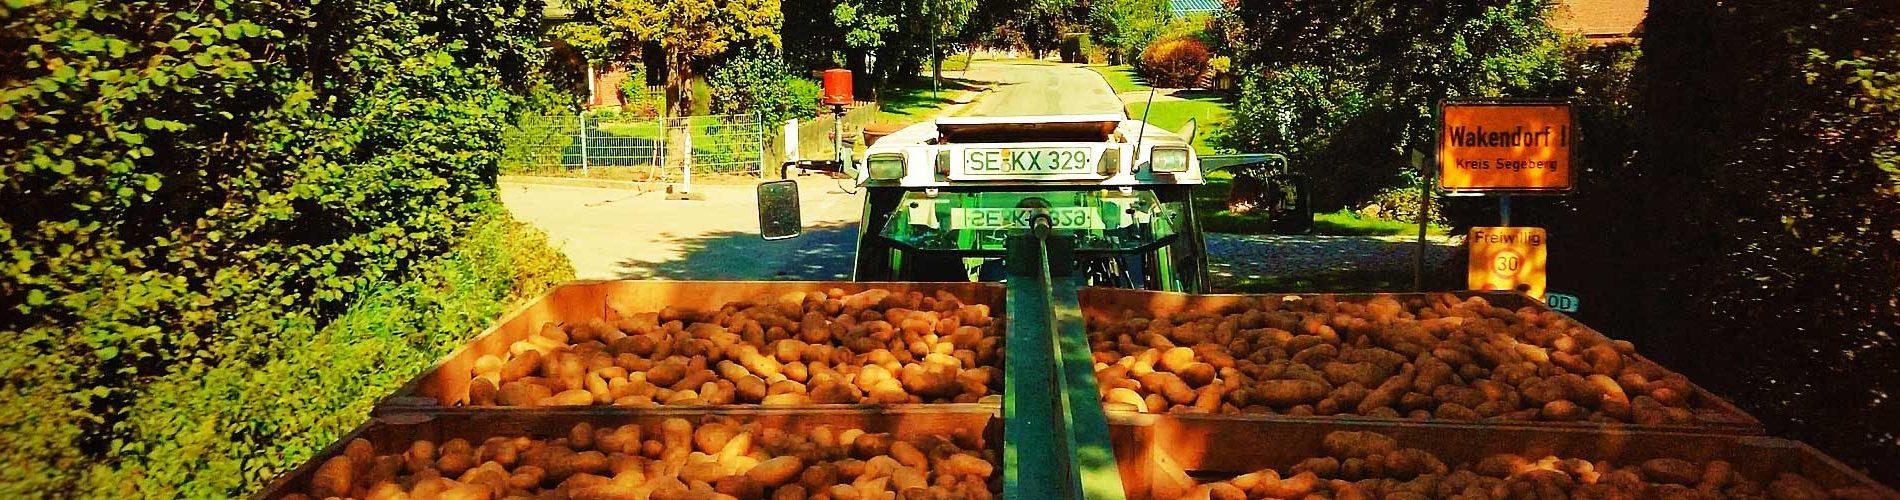 Hof-Burmeister-Kartoffeln-Trecker-1900x500